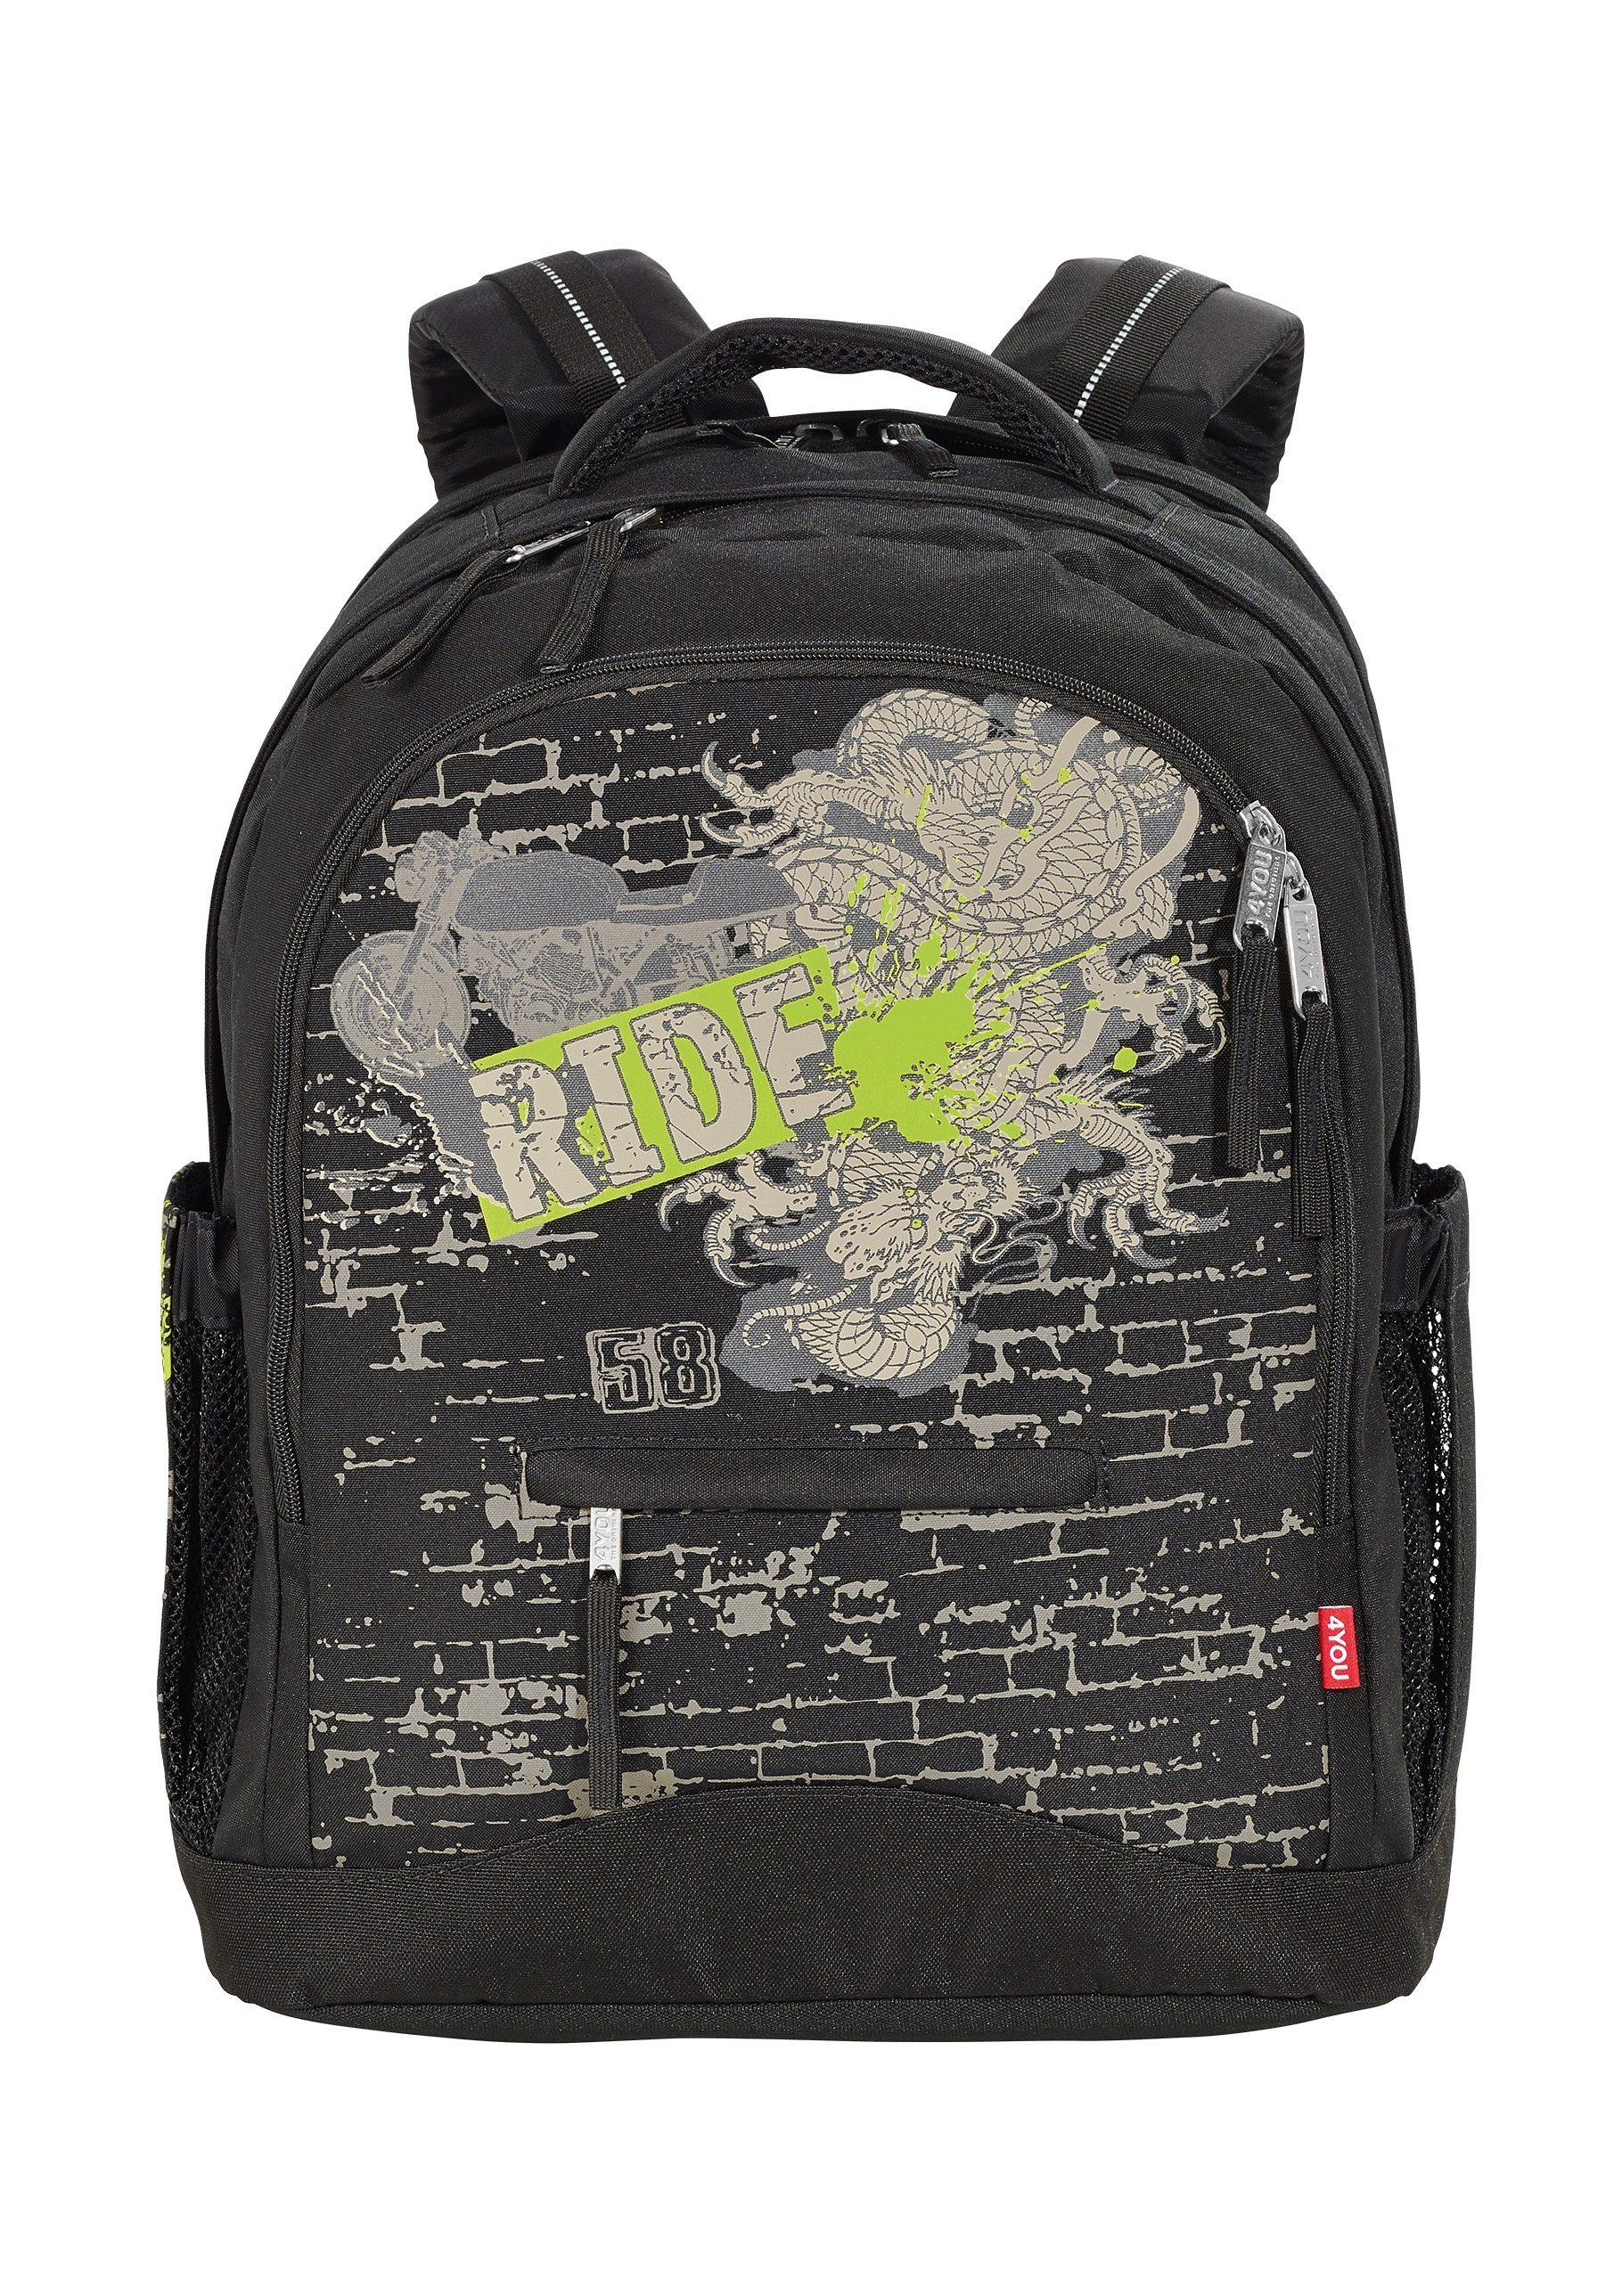 4YOU Schulrucksack, »Rucksack Compact - Ride«